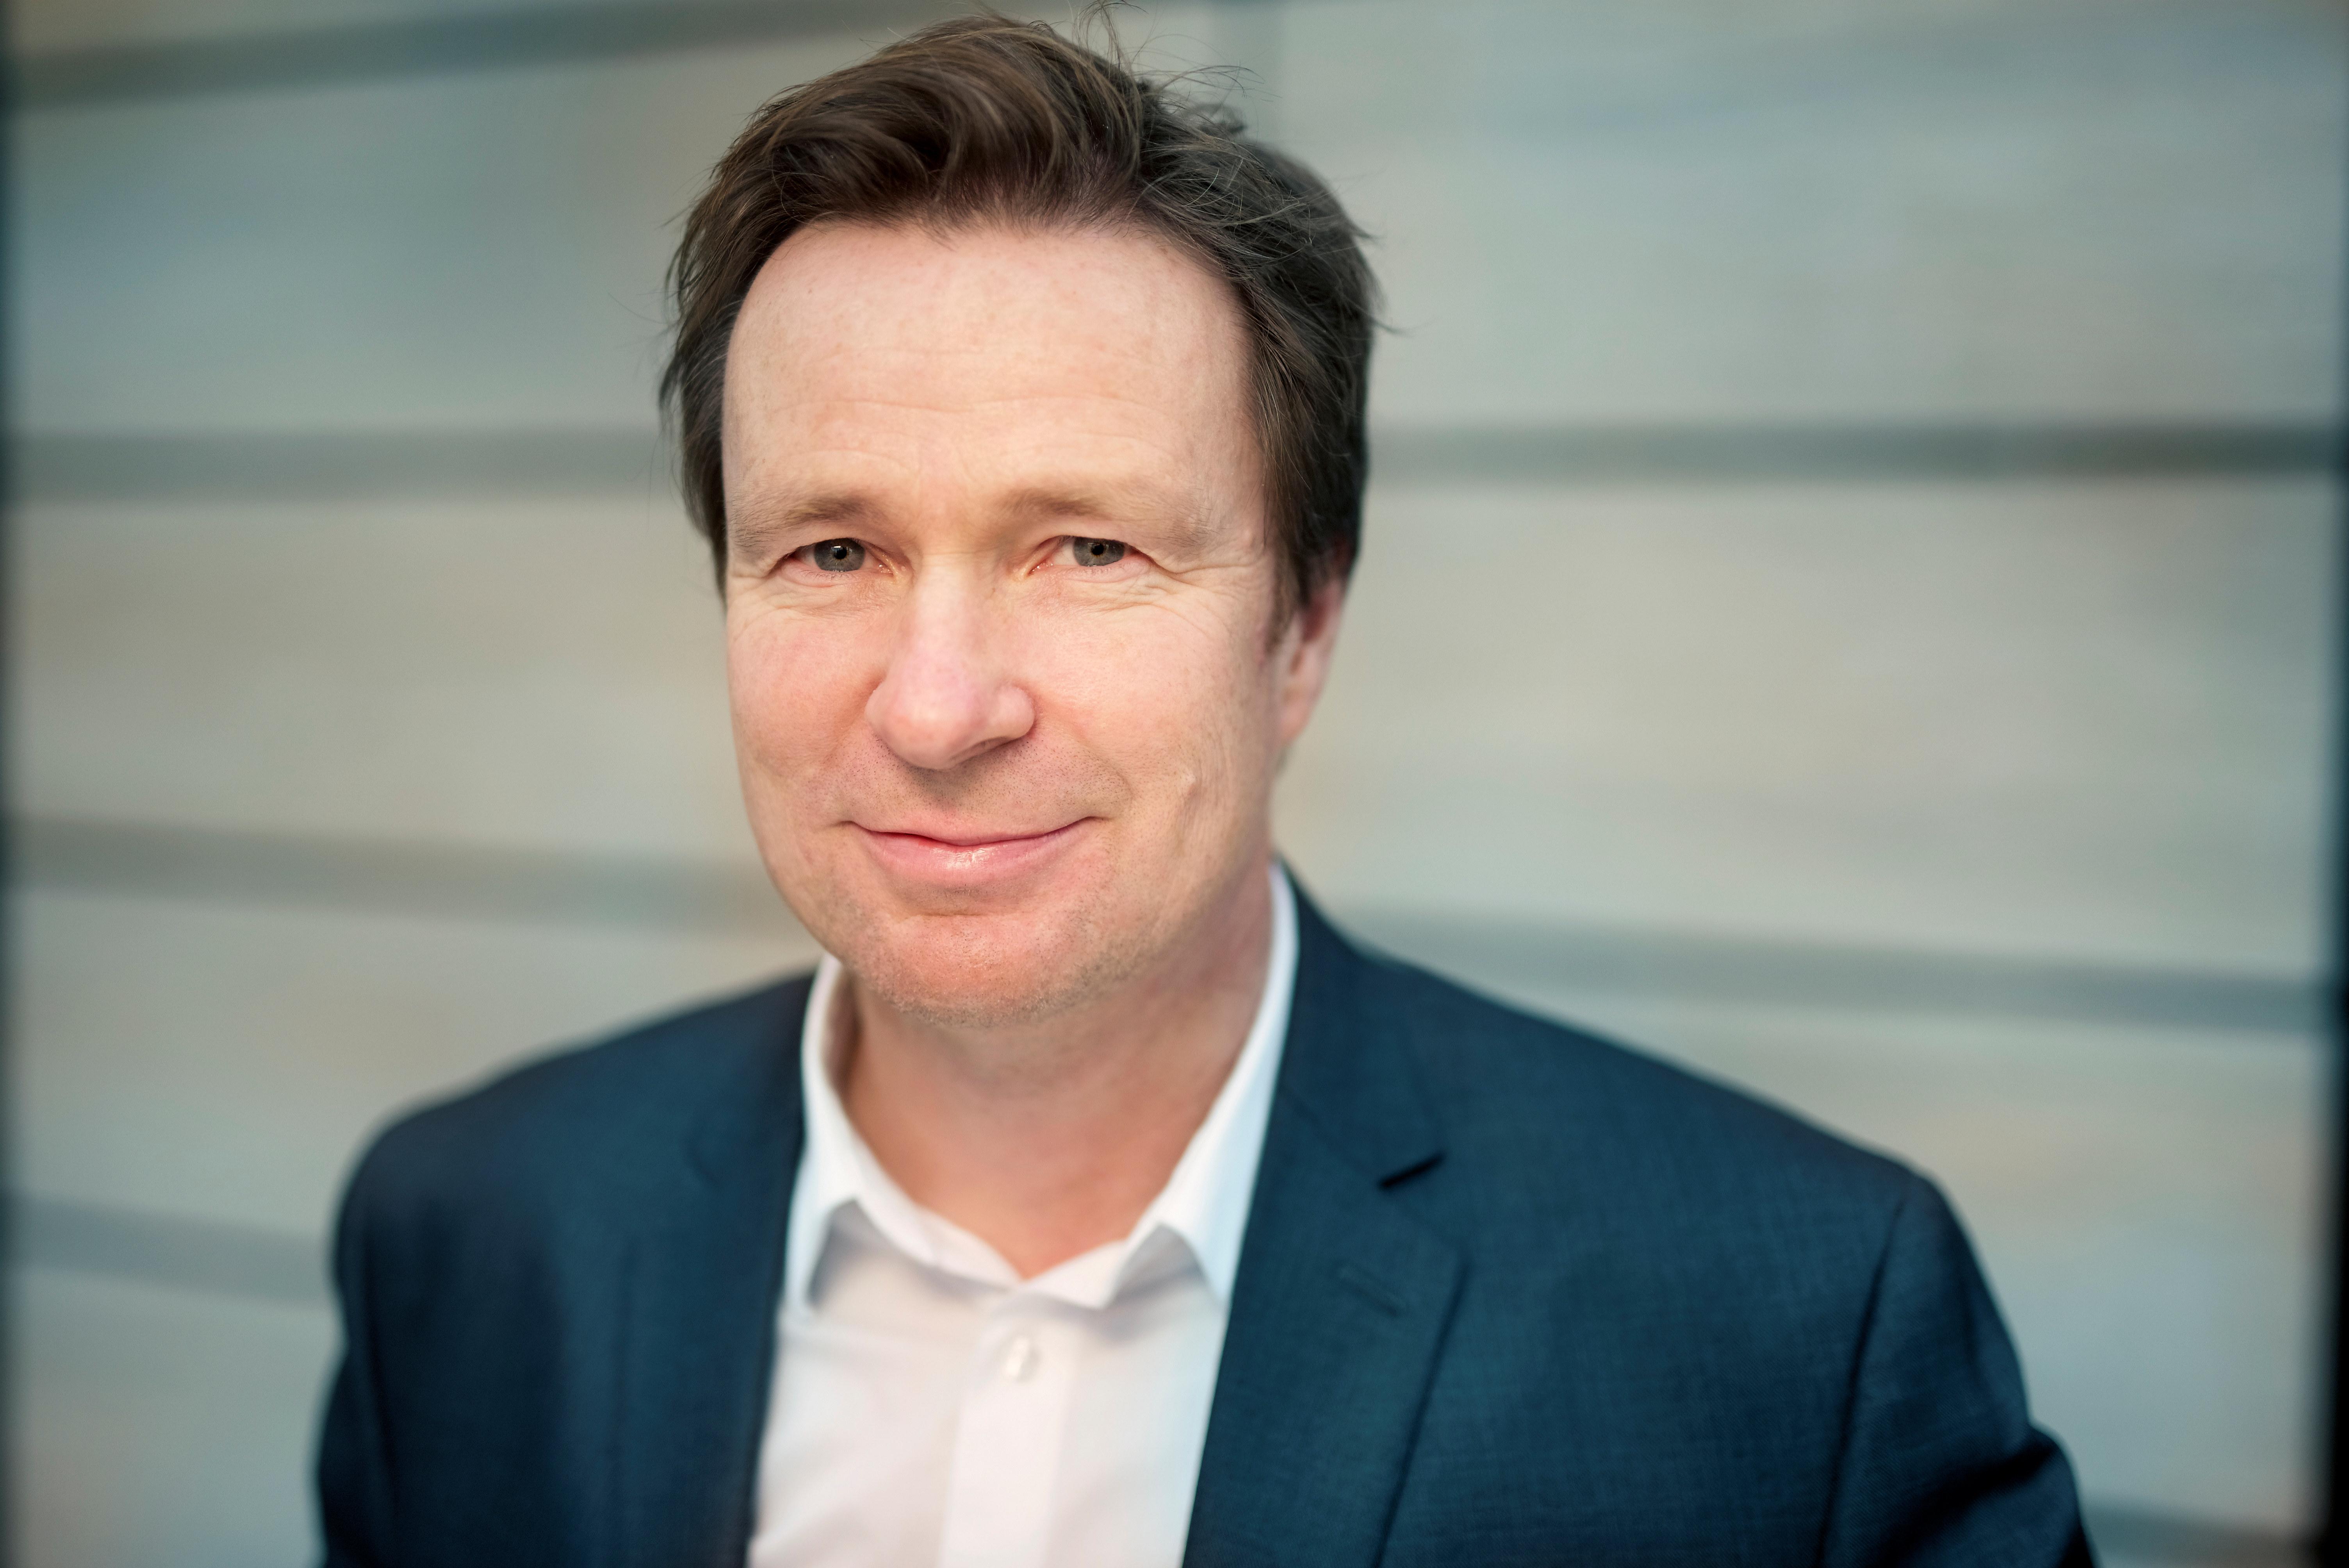 Leder i Evry Norge, Per Kristian Hove.